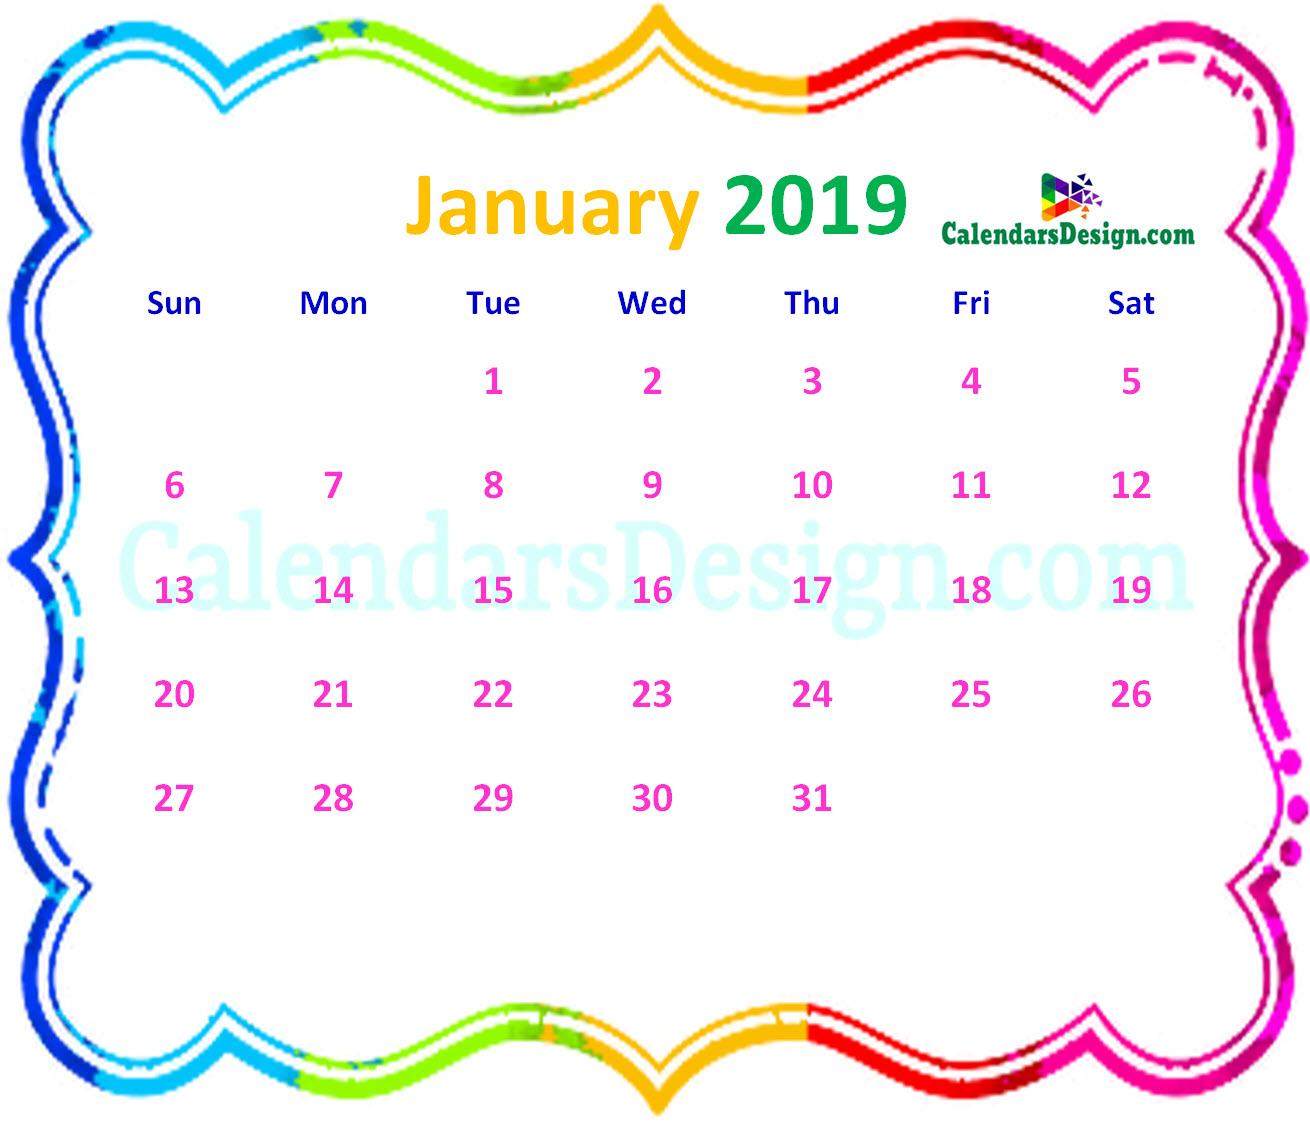 January 2019 Calendar Tumblr